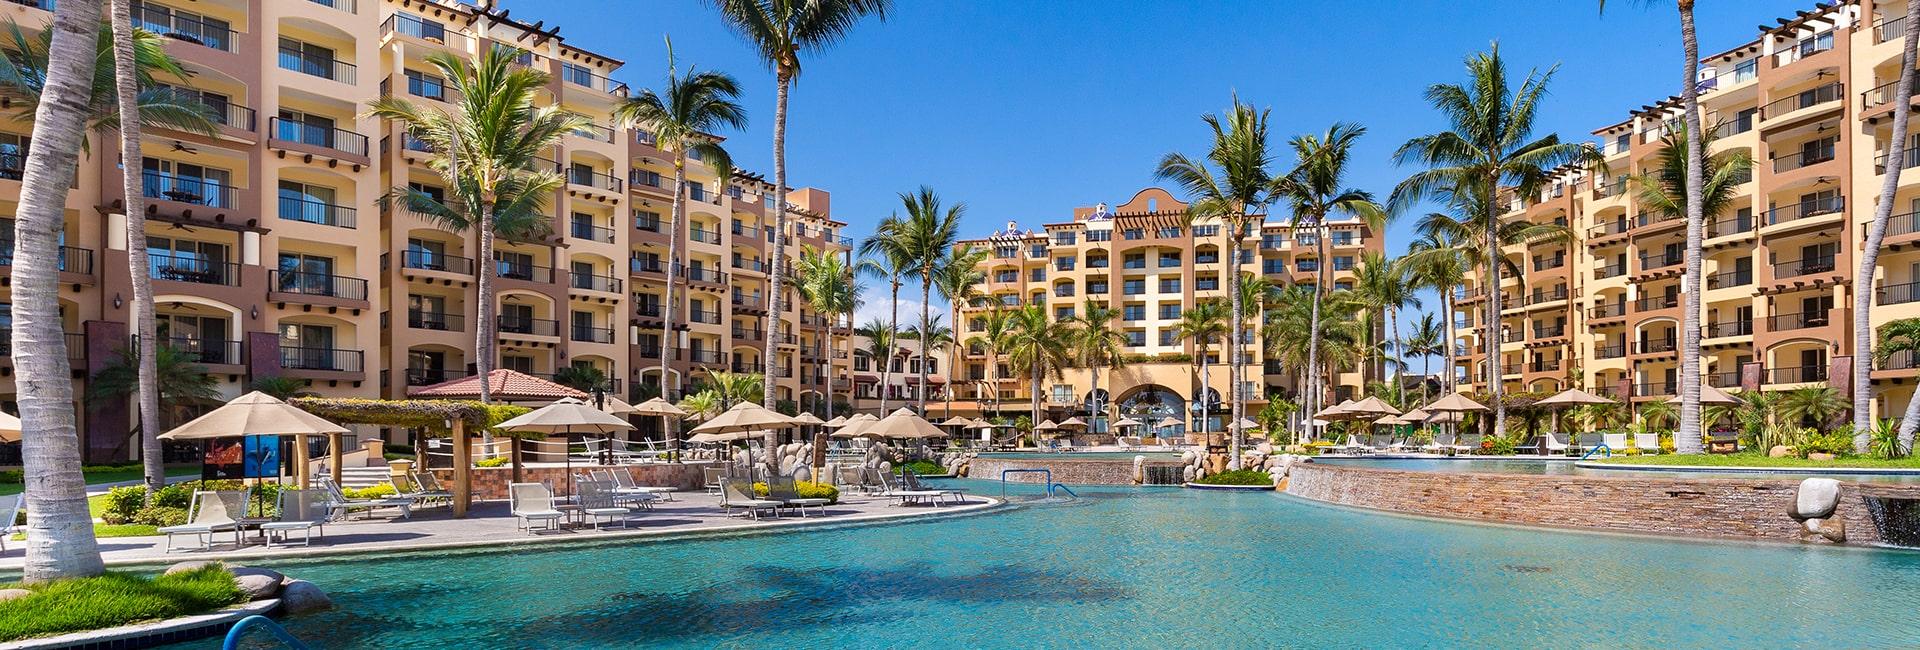 Villa del palmar flamingos wins tripadvisor travellers choice awards 2020